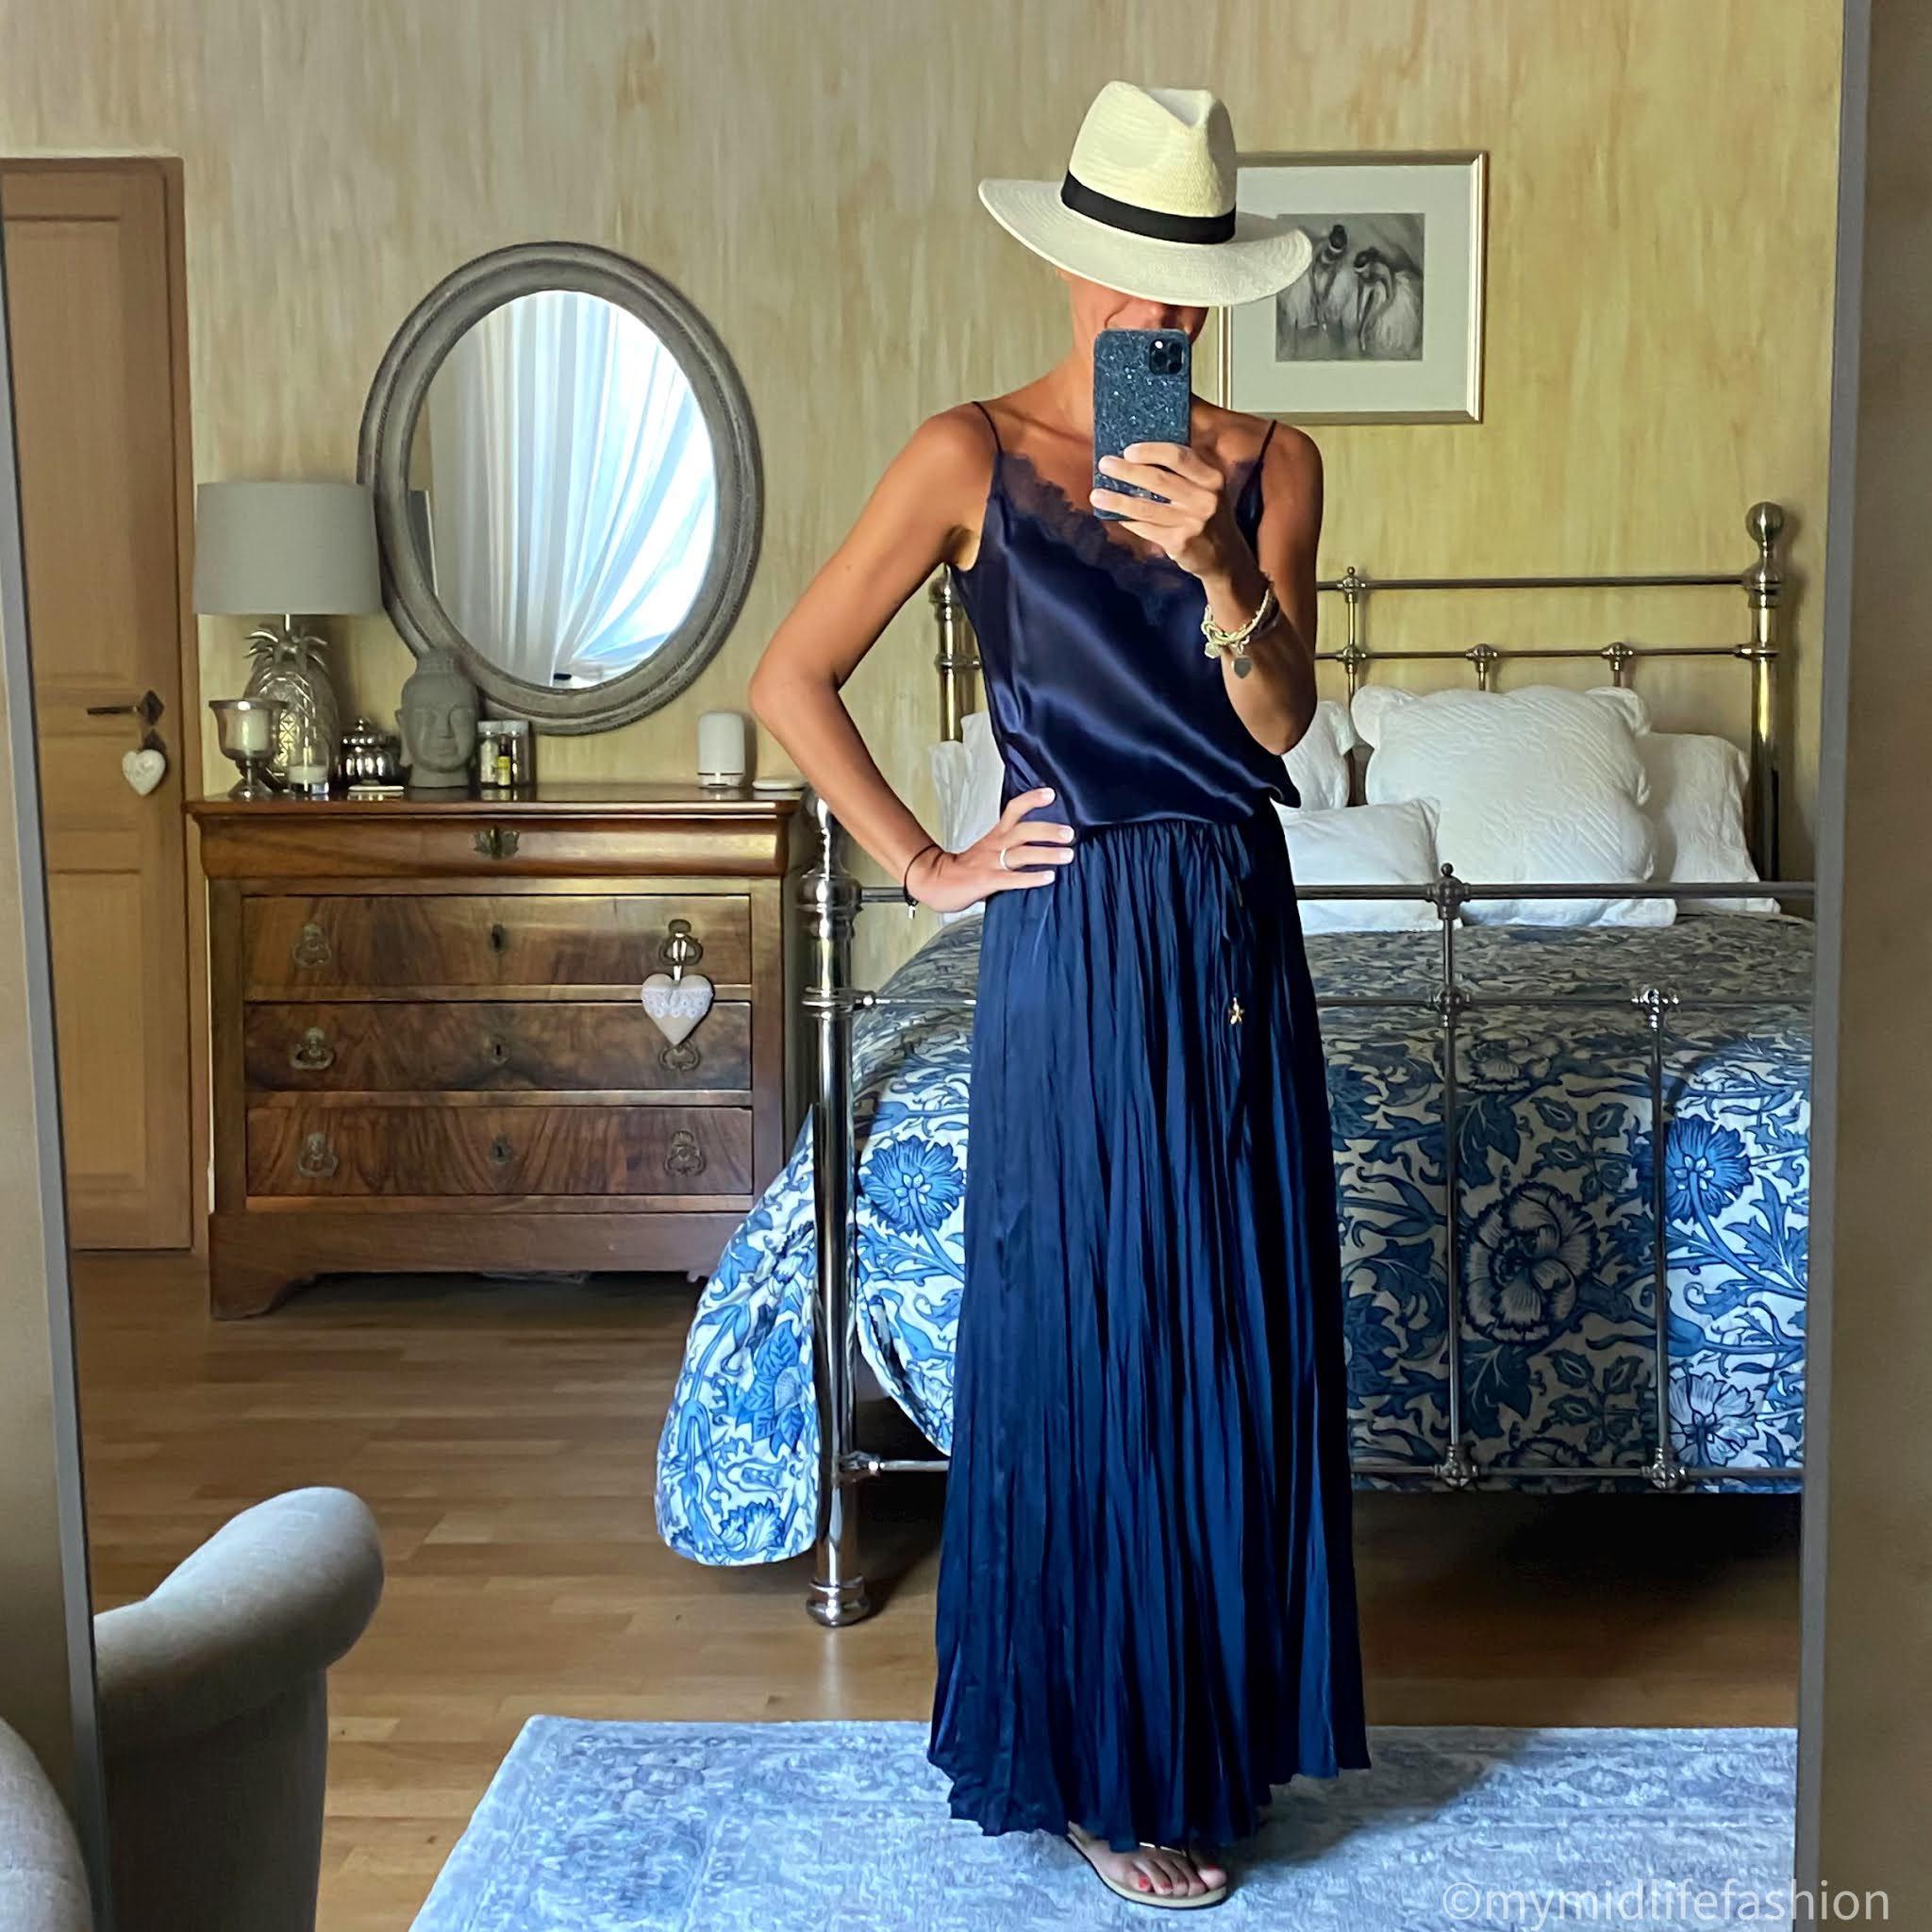 my midlife fashion, zara Panama hat, Massimo Dutti lace trim silk camisole, zara wrinkled satin-effect skirt, havaianas slim fit gold flip flops